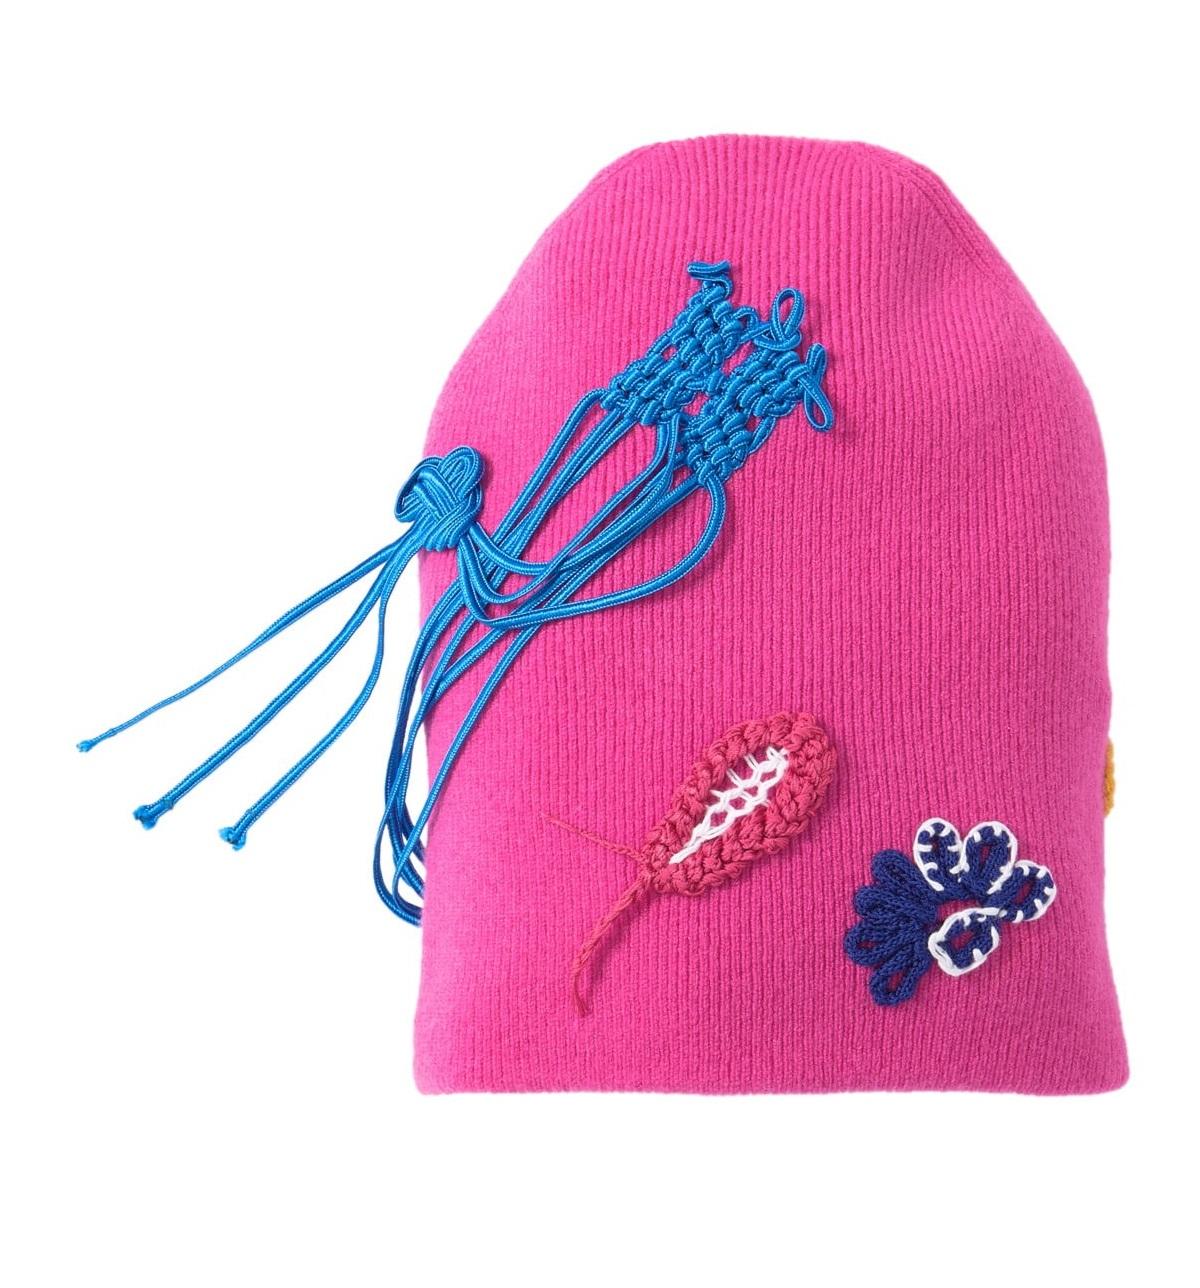 Burberry Fuchsia Pink Floral Crochet Cashmere Blend Beanie In Multi